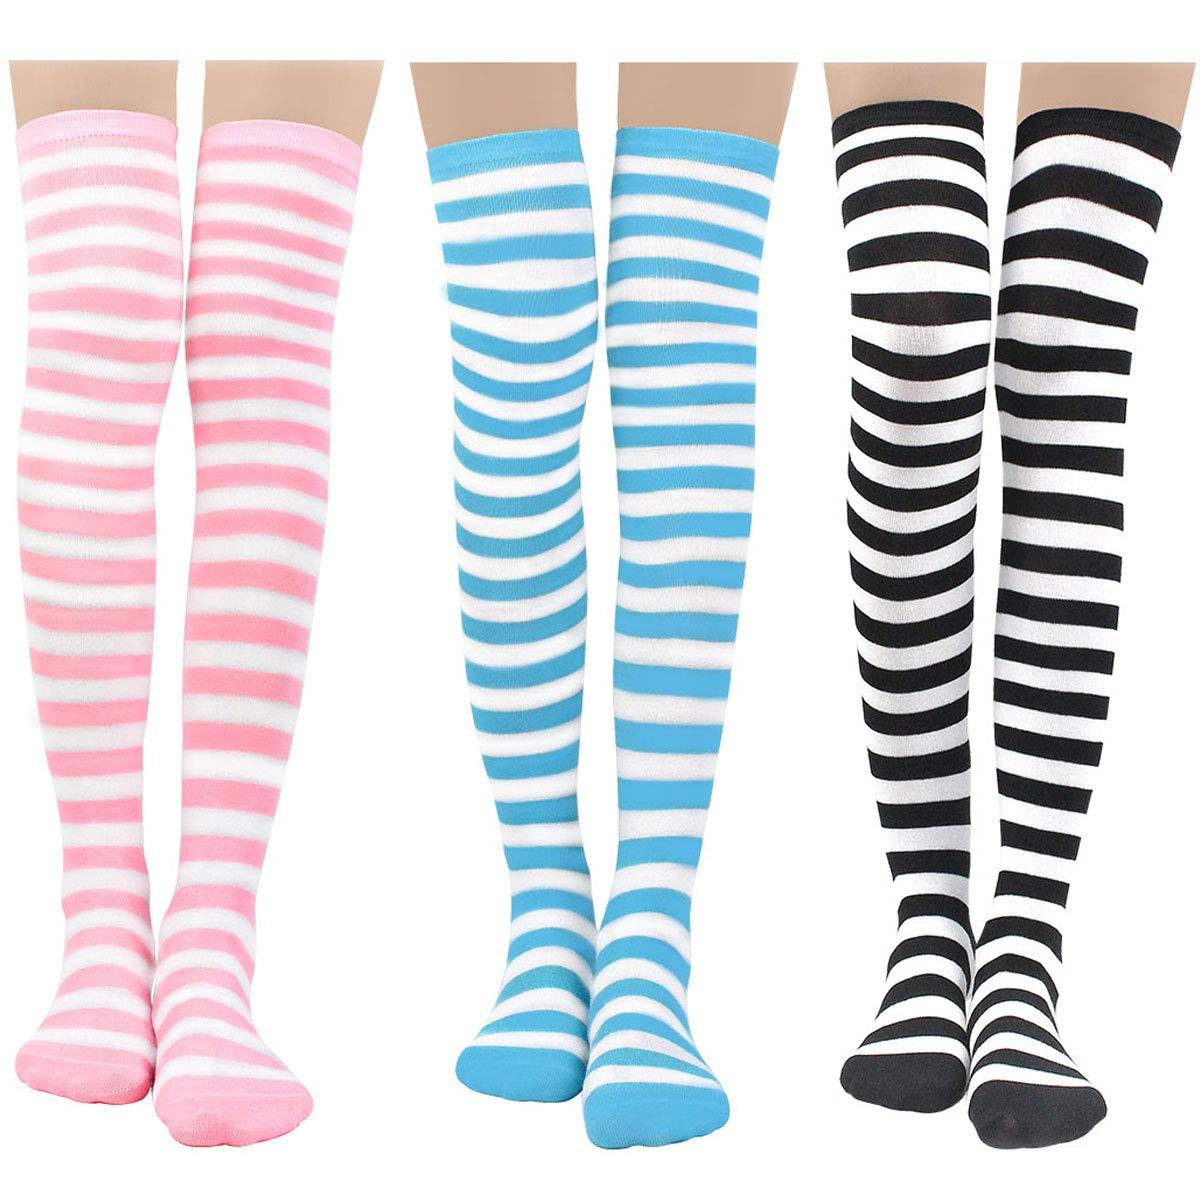 Womens Knit Knee-High Socks - Leg Warmer Knit Crochet High Boot Thigh Socks Leggings (3 pairs-fine)